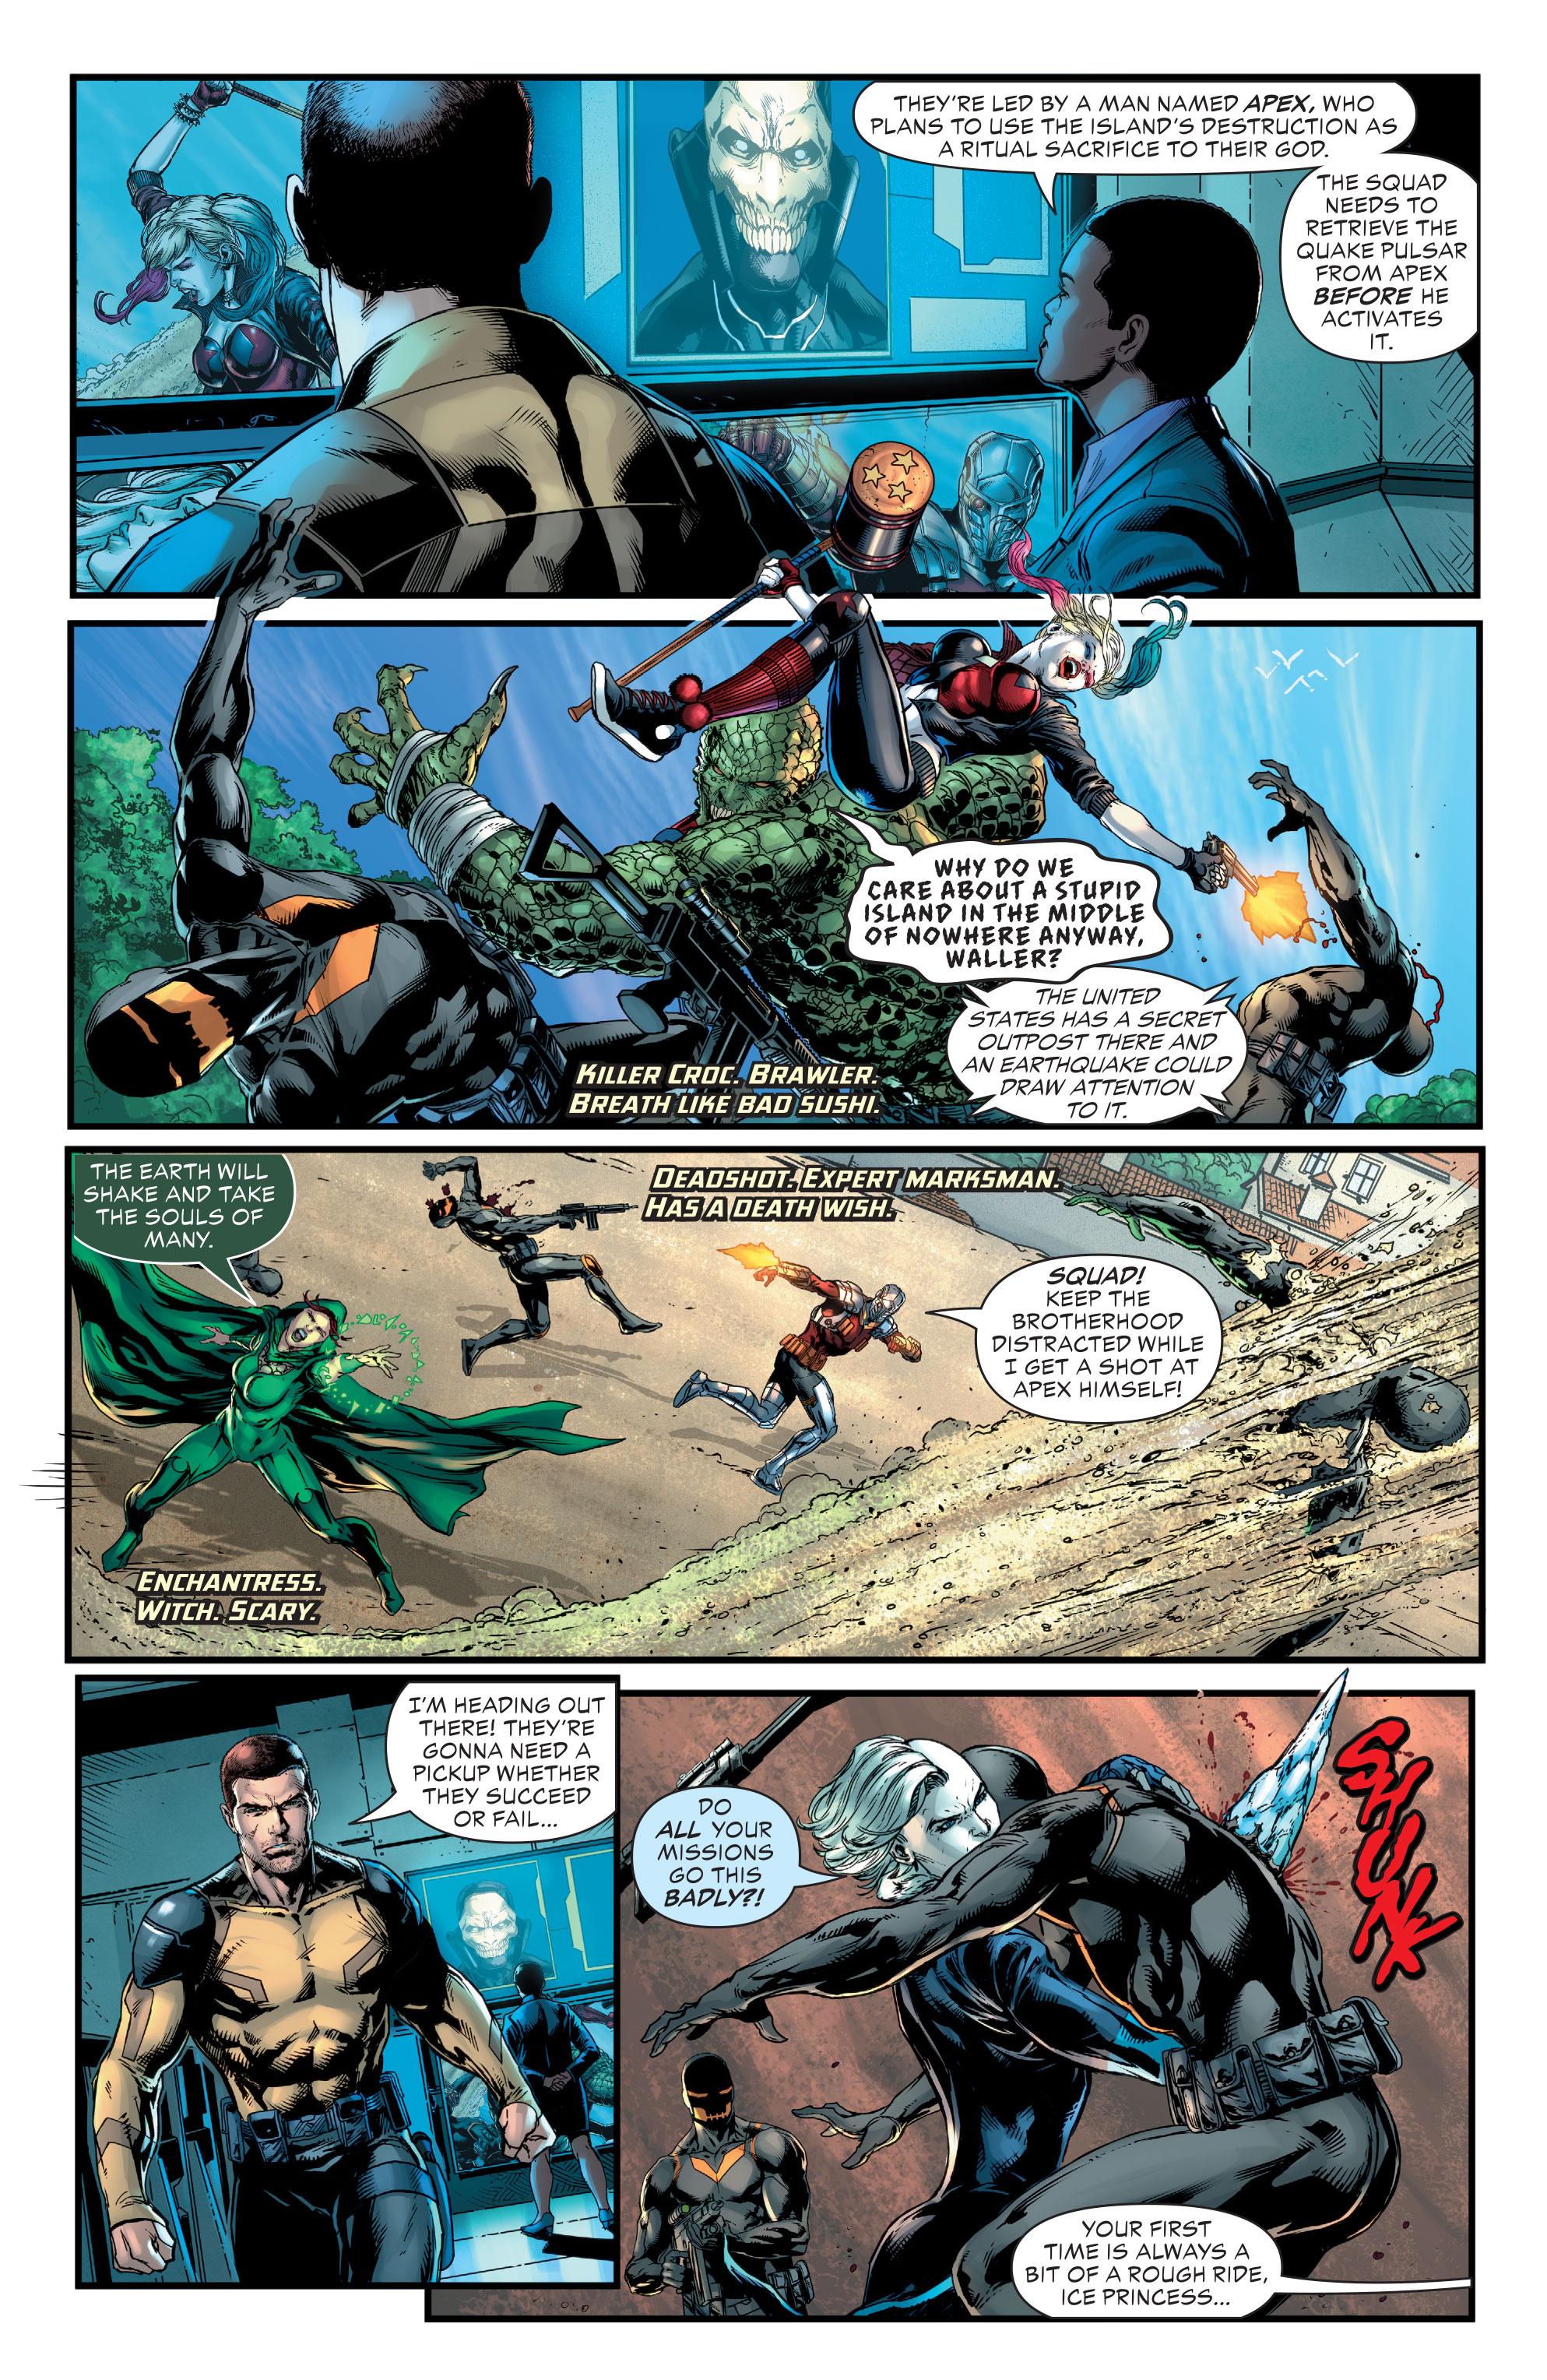 DC REBORN ROUND-UP: Amanda Waller Scrutinized in BATMAN #13